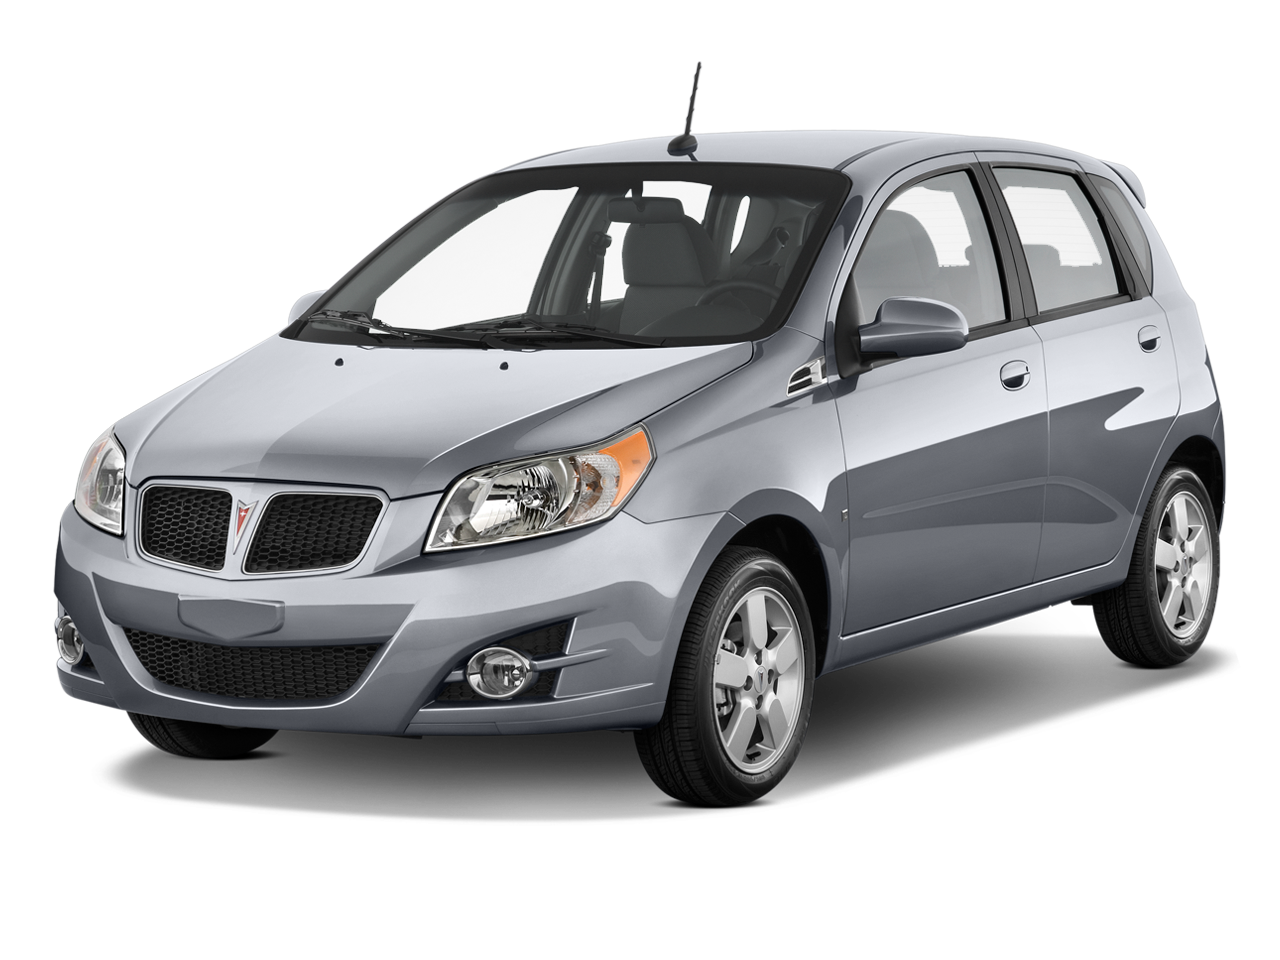 Pontiac Cars - International Car Price & Overview